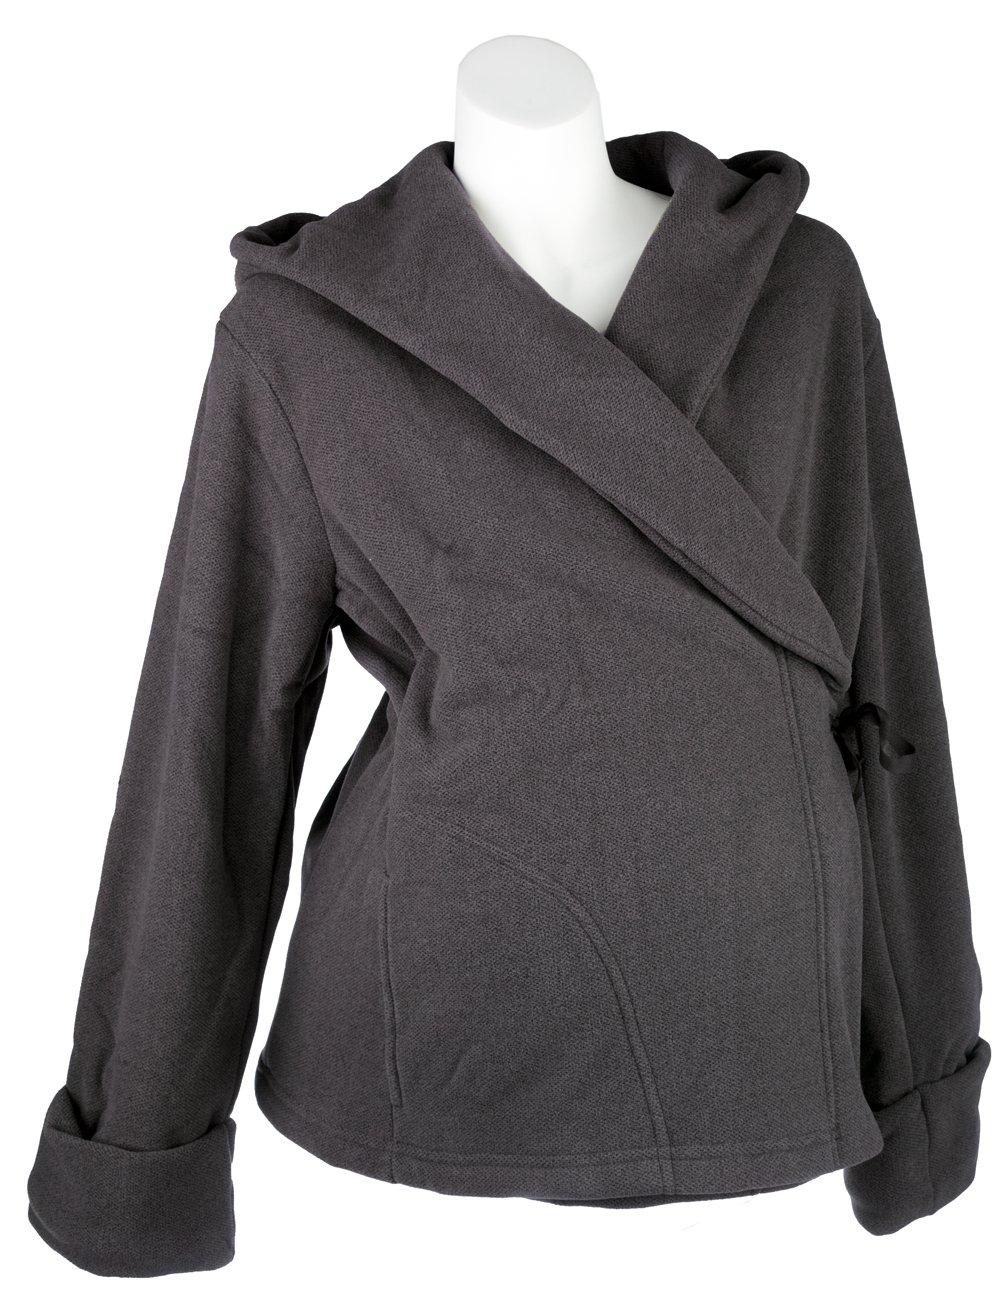 Mountain Mama Women's Fairview Maternity Fleece Wrap Jacket, Charcoal, XX-Large